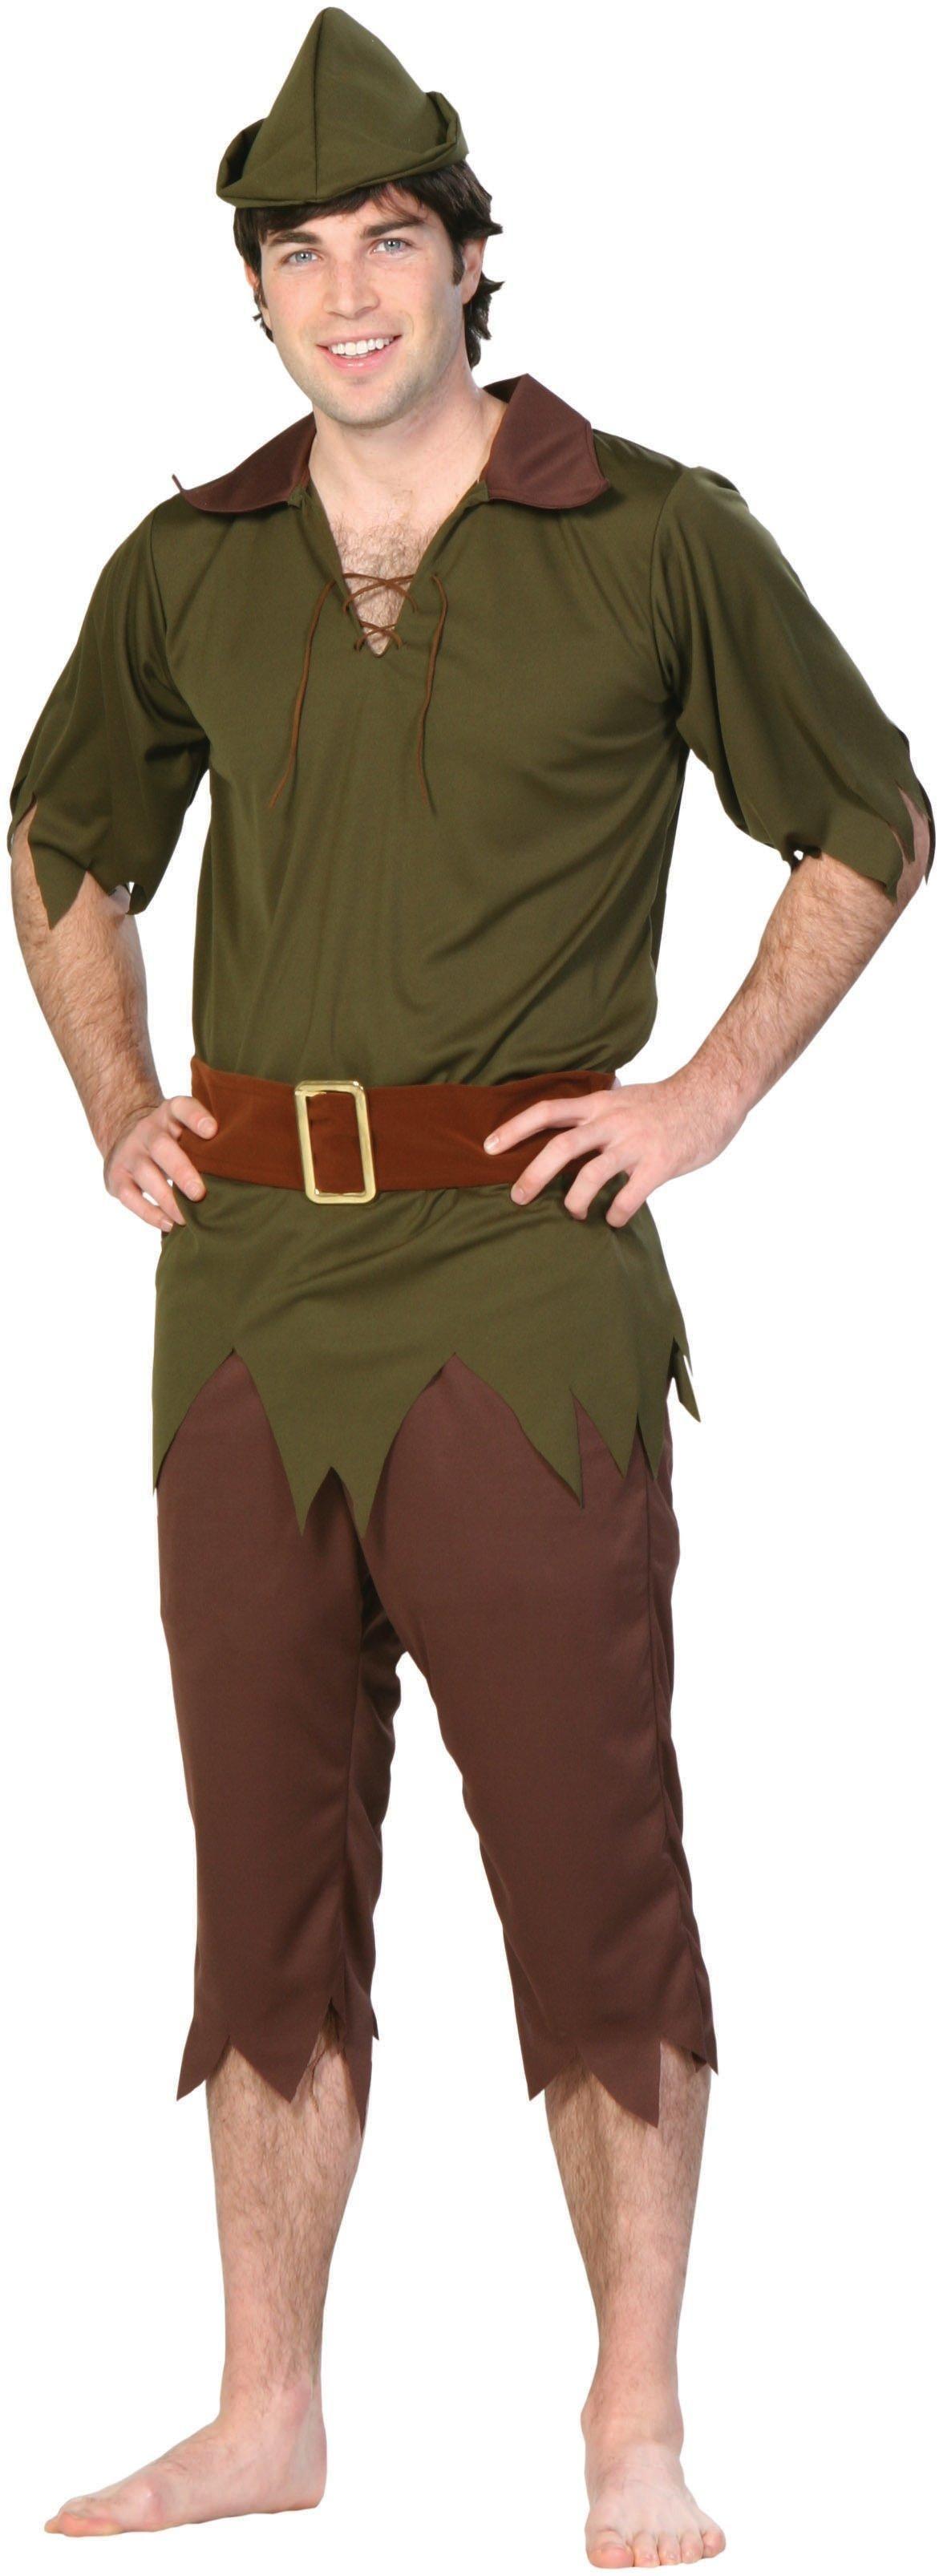 pan Adult costumes peter